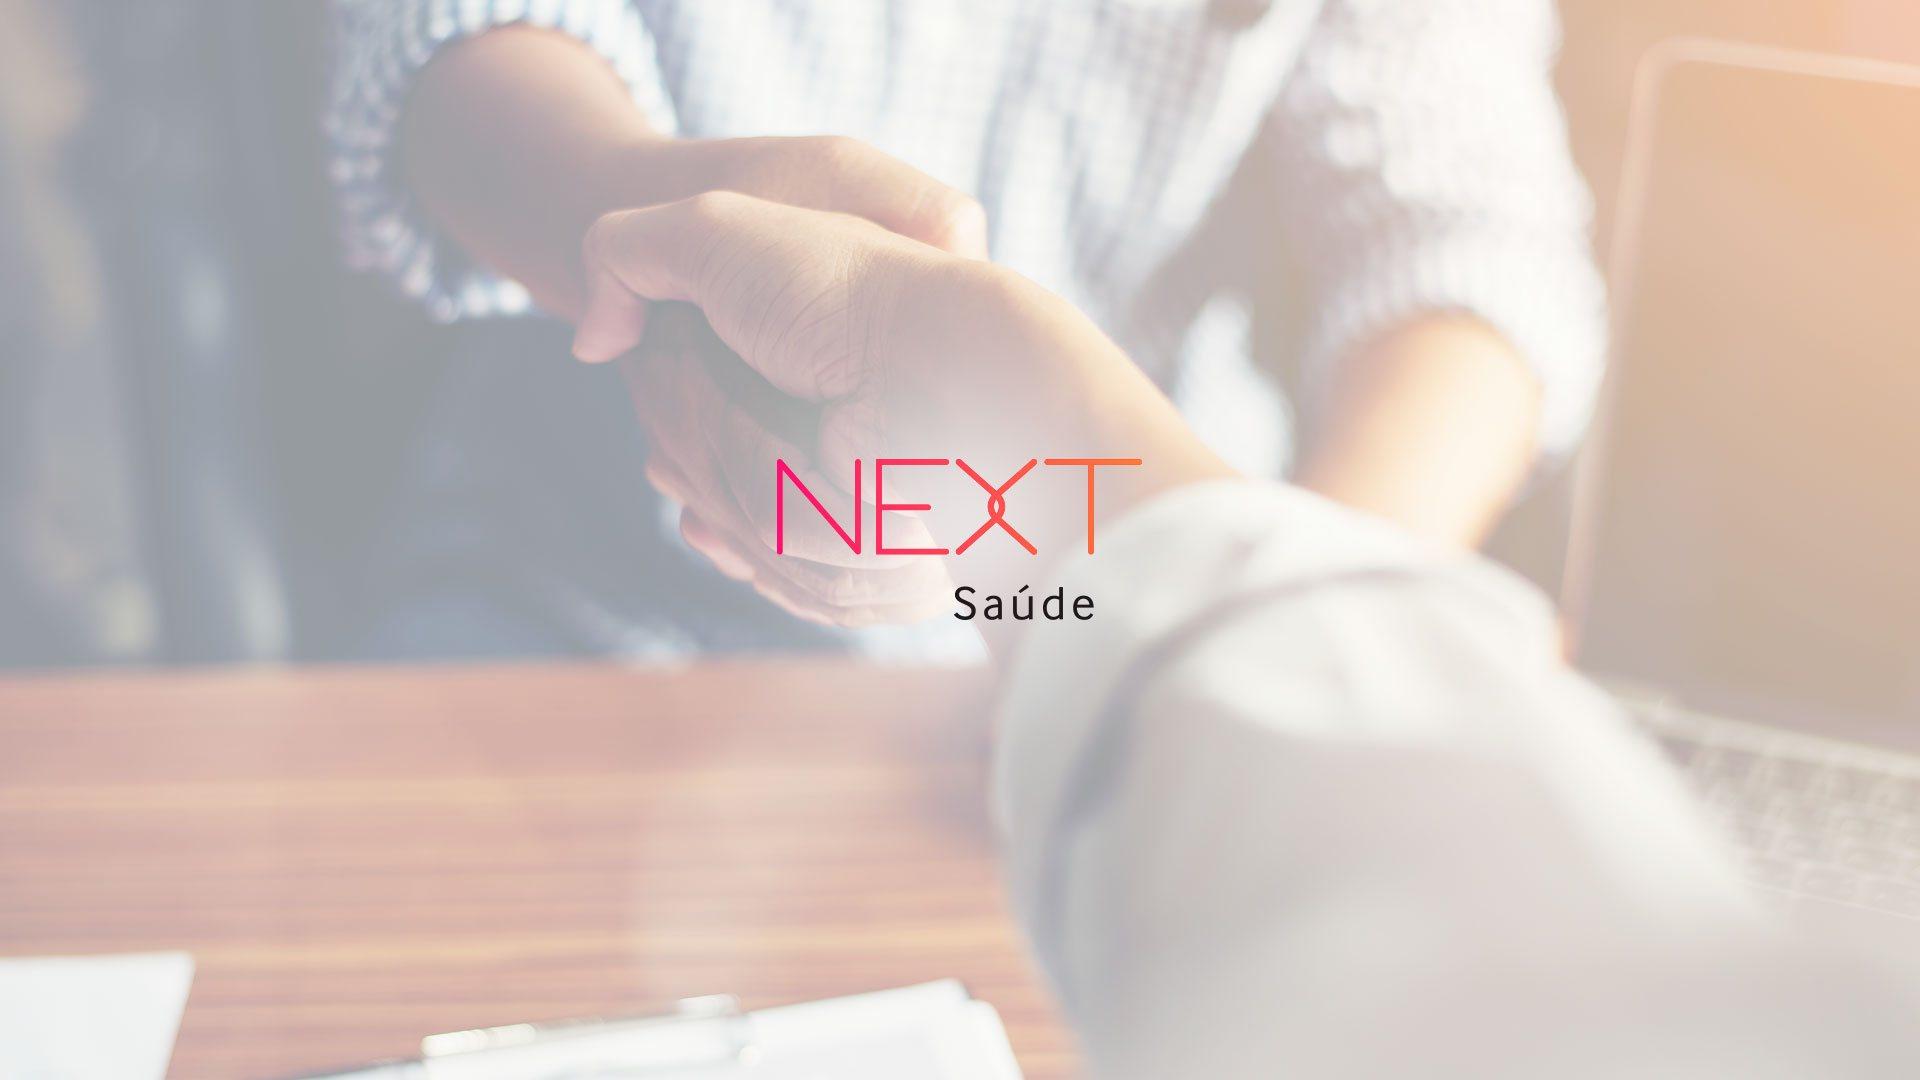 Next Saúde PME, planos de saúde empresarial